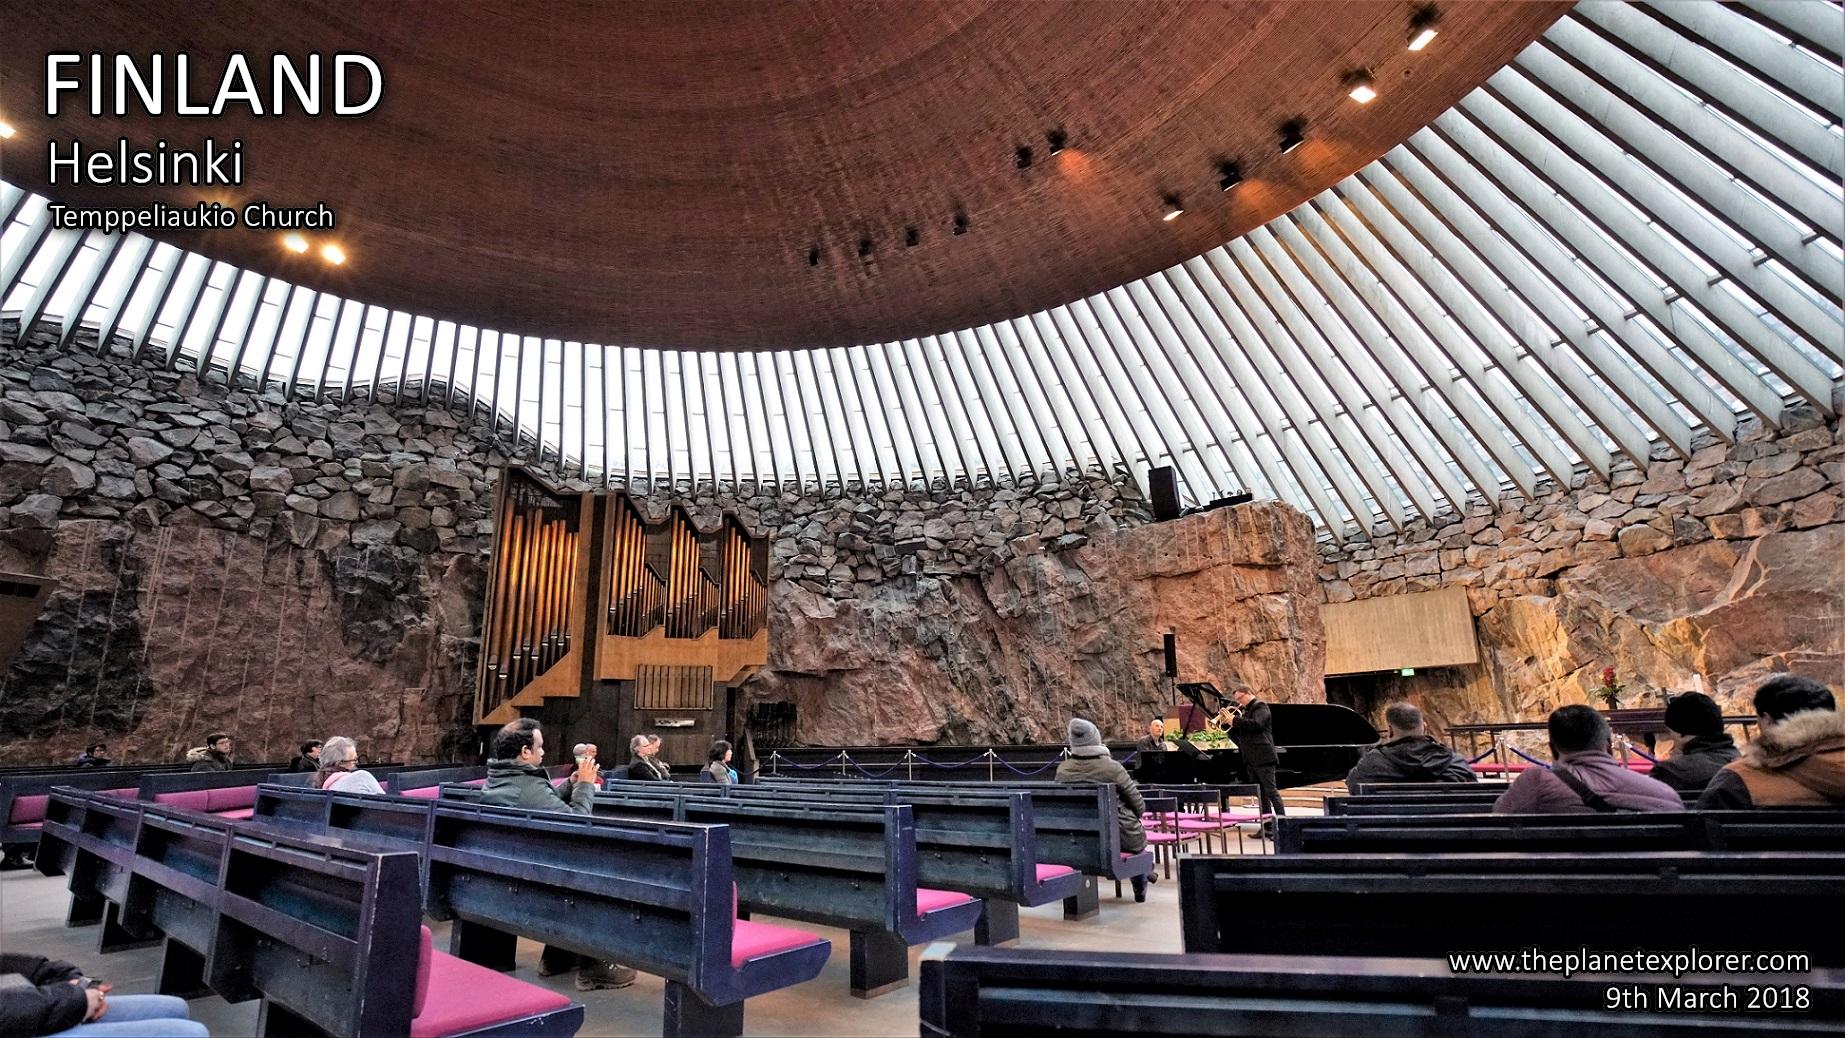 20180309_1545_Finland_Helsinki_Temppeliaukio Church_DSC00284_Sony a7R2_LR_@www